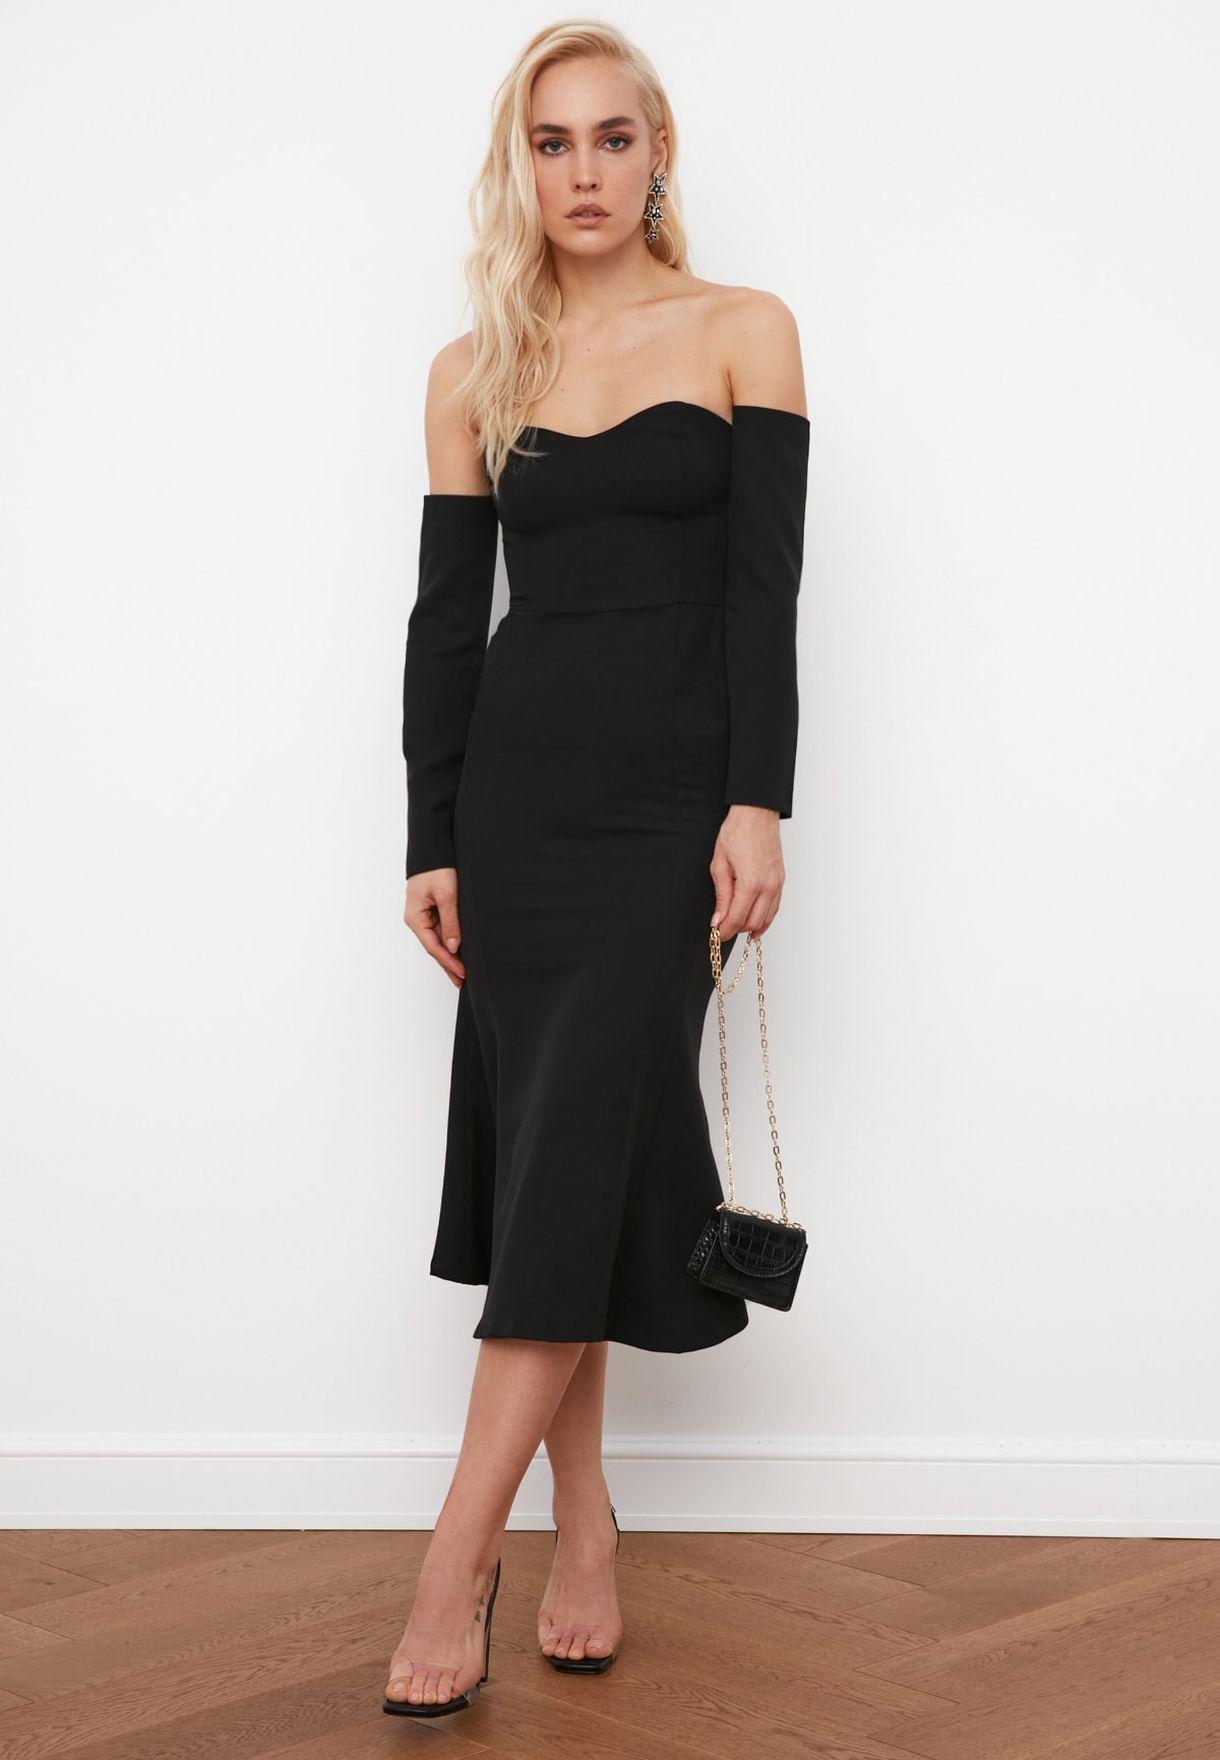 Black Sleeve Detailed Dress